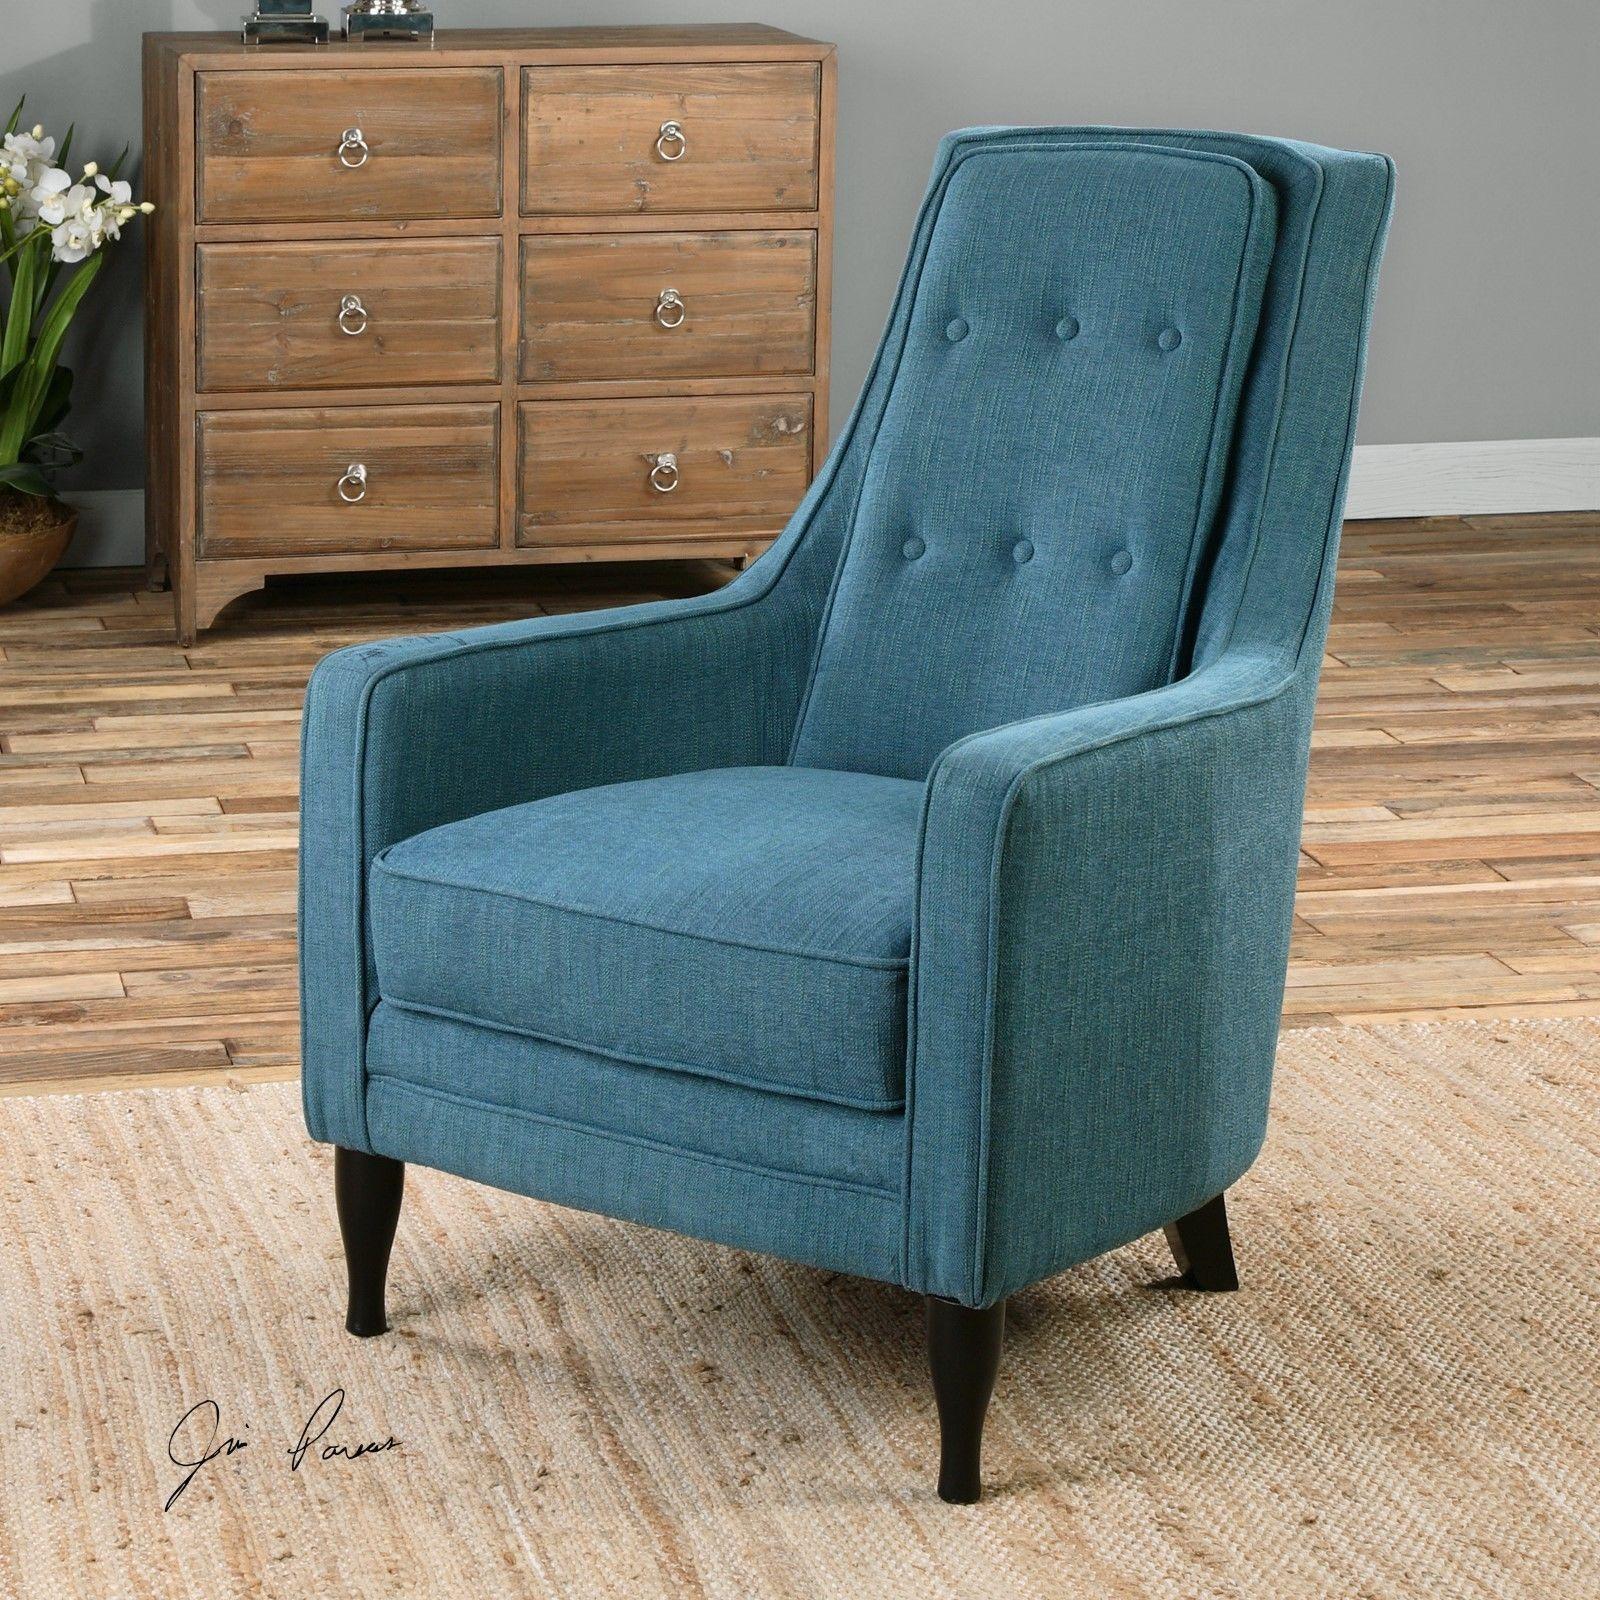 Rollins Modern Arm Chair Blue: PEACOCK PLUSH BLUE ARM HIGH BACK ACCENT CLUB CHAIR EBONY